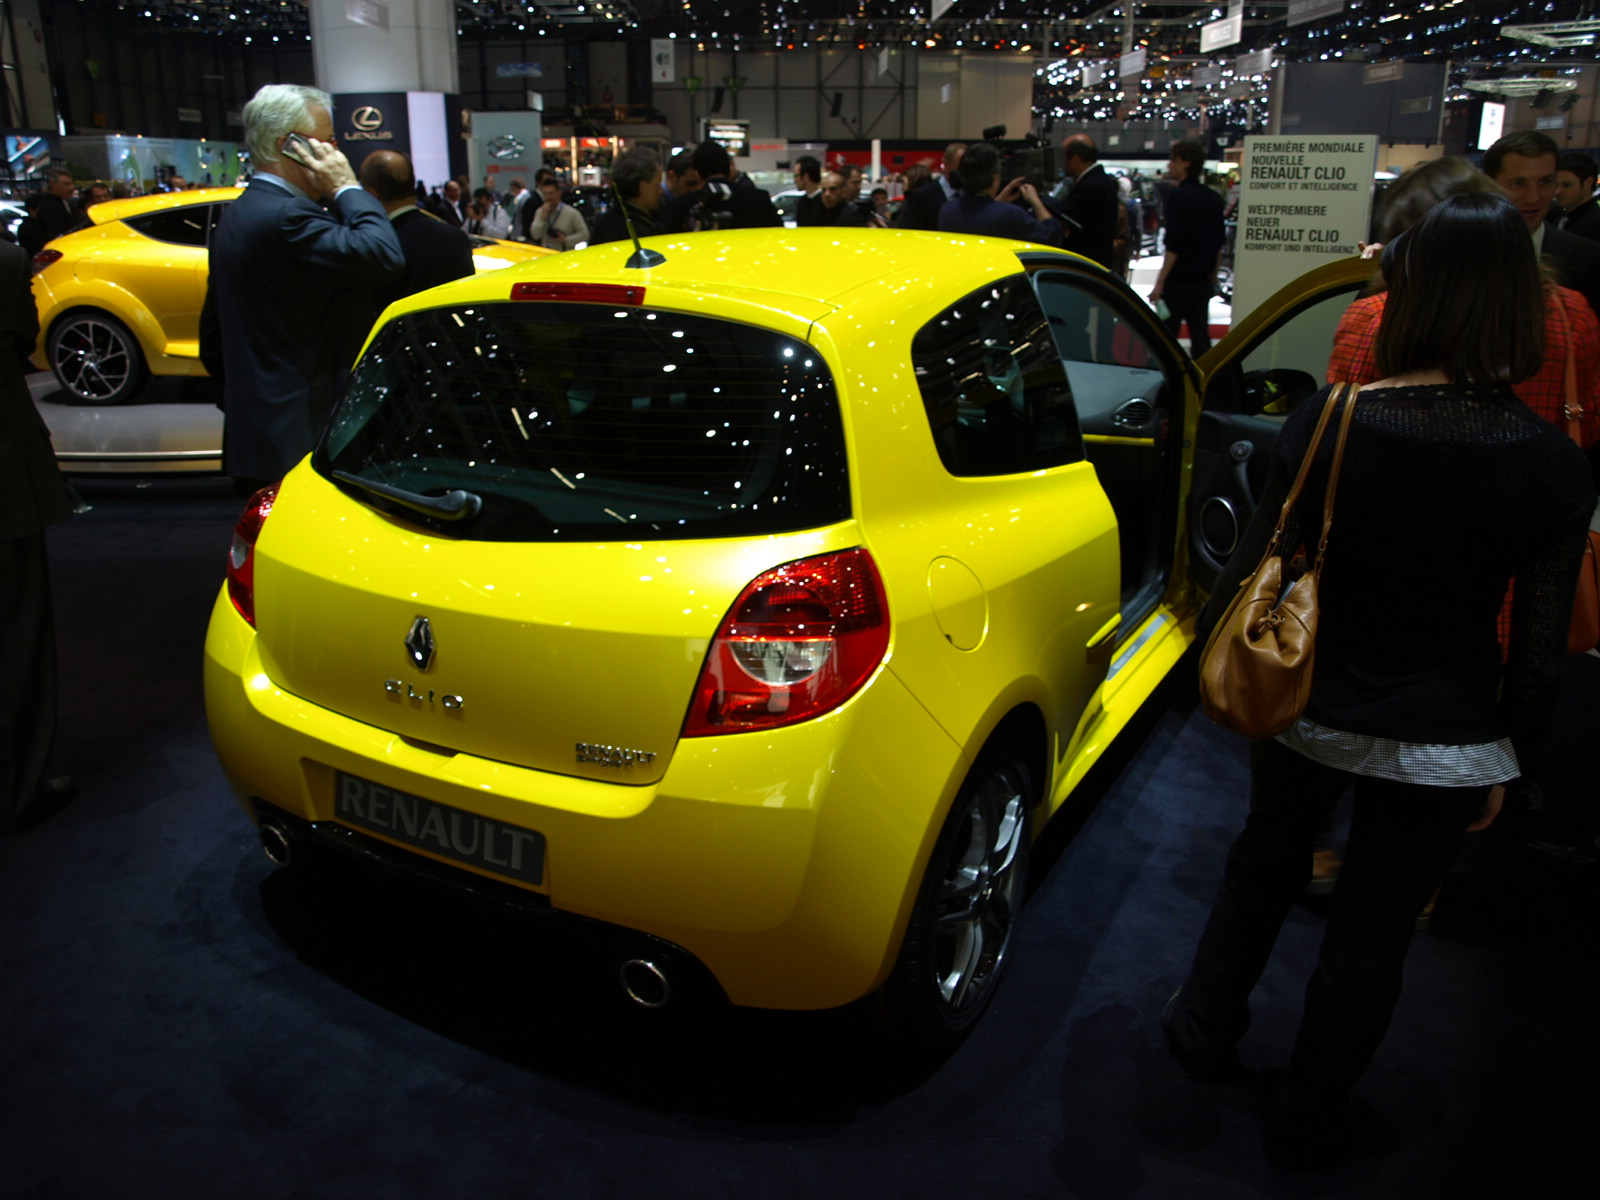 S0-Renault-Clio-RS-radicale-46842